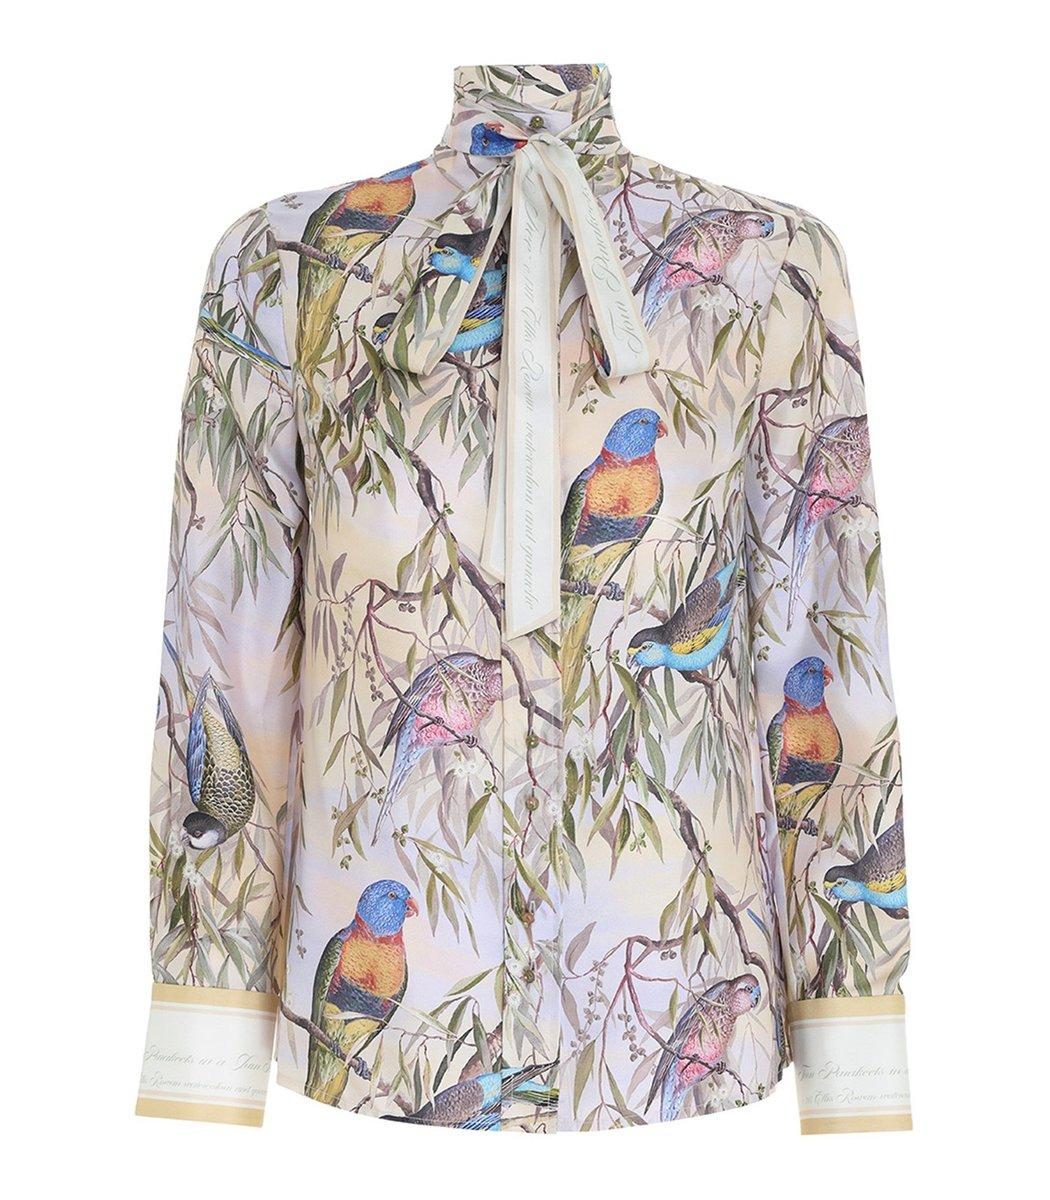 Zimmermann Candescent Shirt in Parakeets